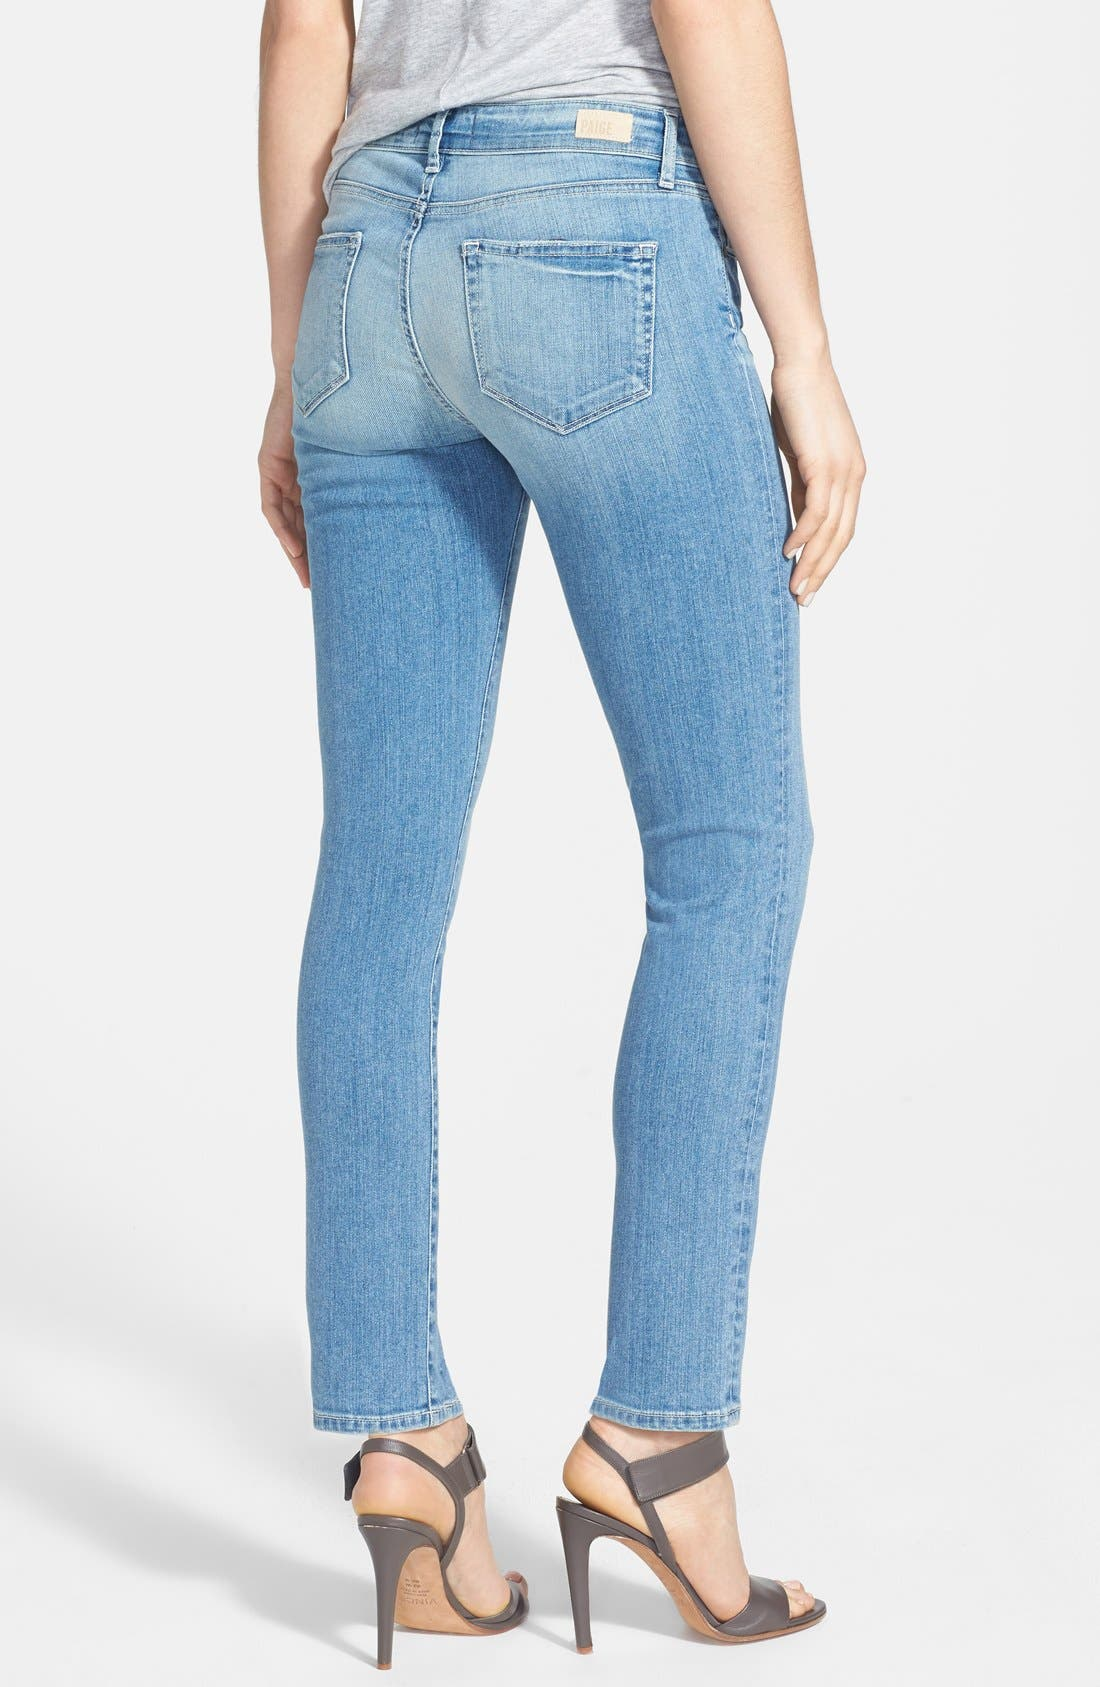 Alternate Image 2  - Paige Denim 'Skyline' Ankle Peg Skinny Jeans (Whitley)